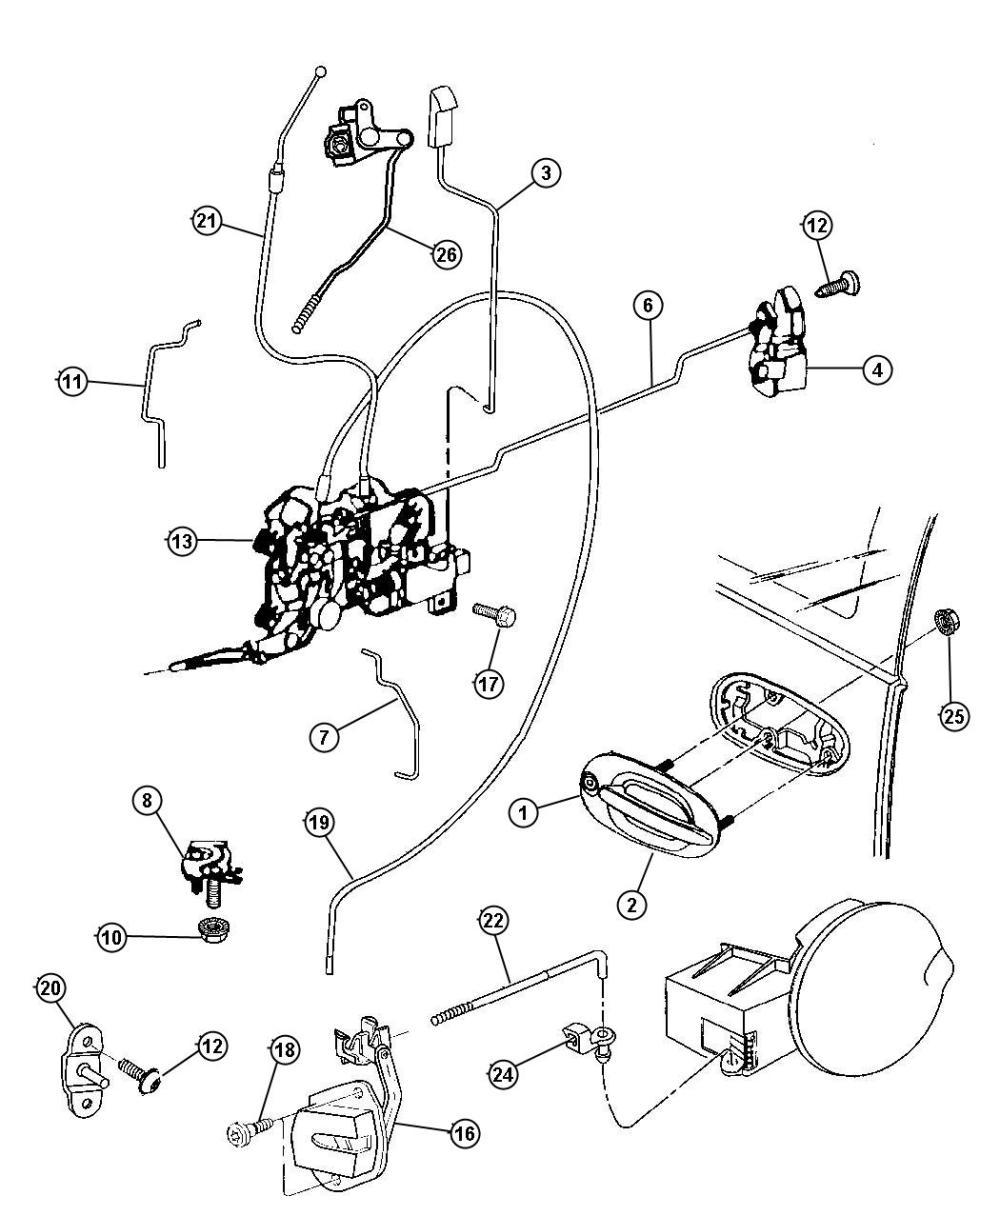 medium resolution of 1998 plymouth grand voyager problems imageresizertool com 1994 plymouth voyager engine diagram dodge nitro engine diagram